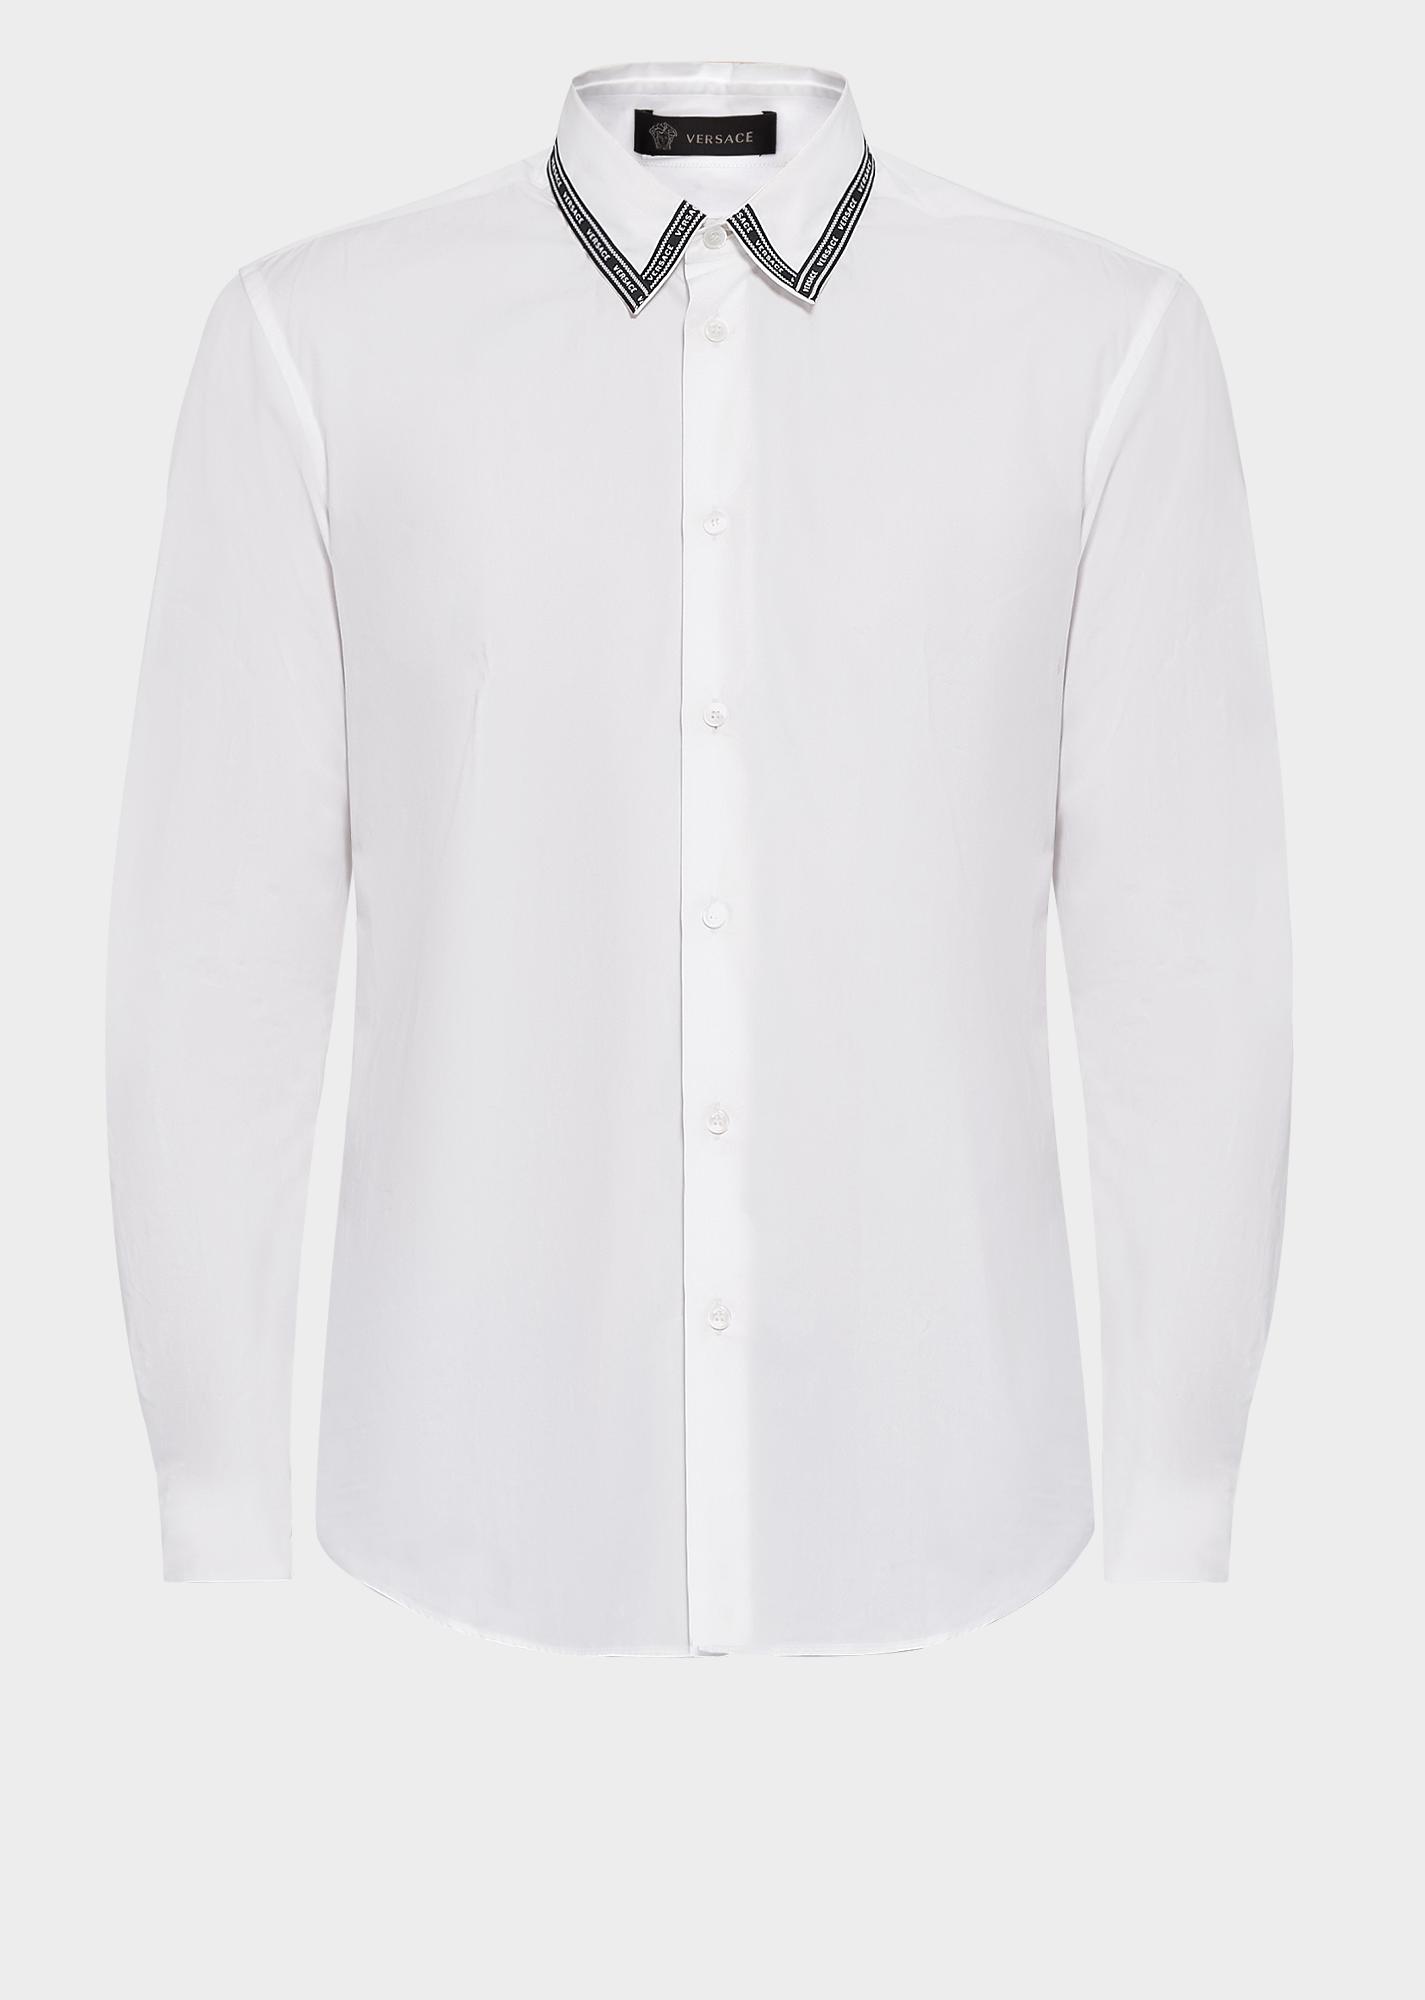 540c455c Nastro Versace Collar Shirt